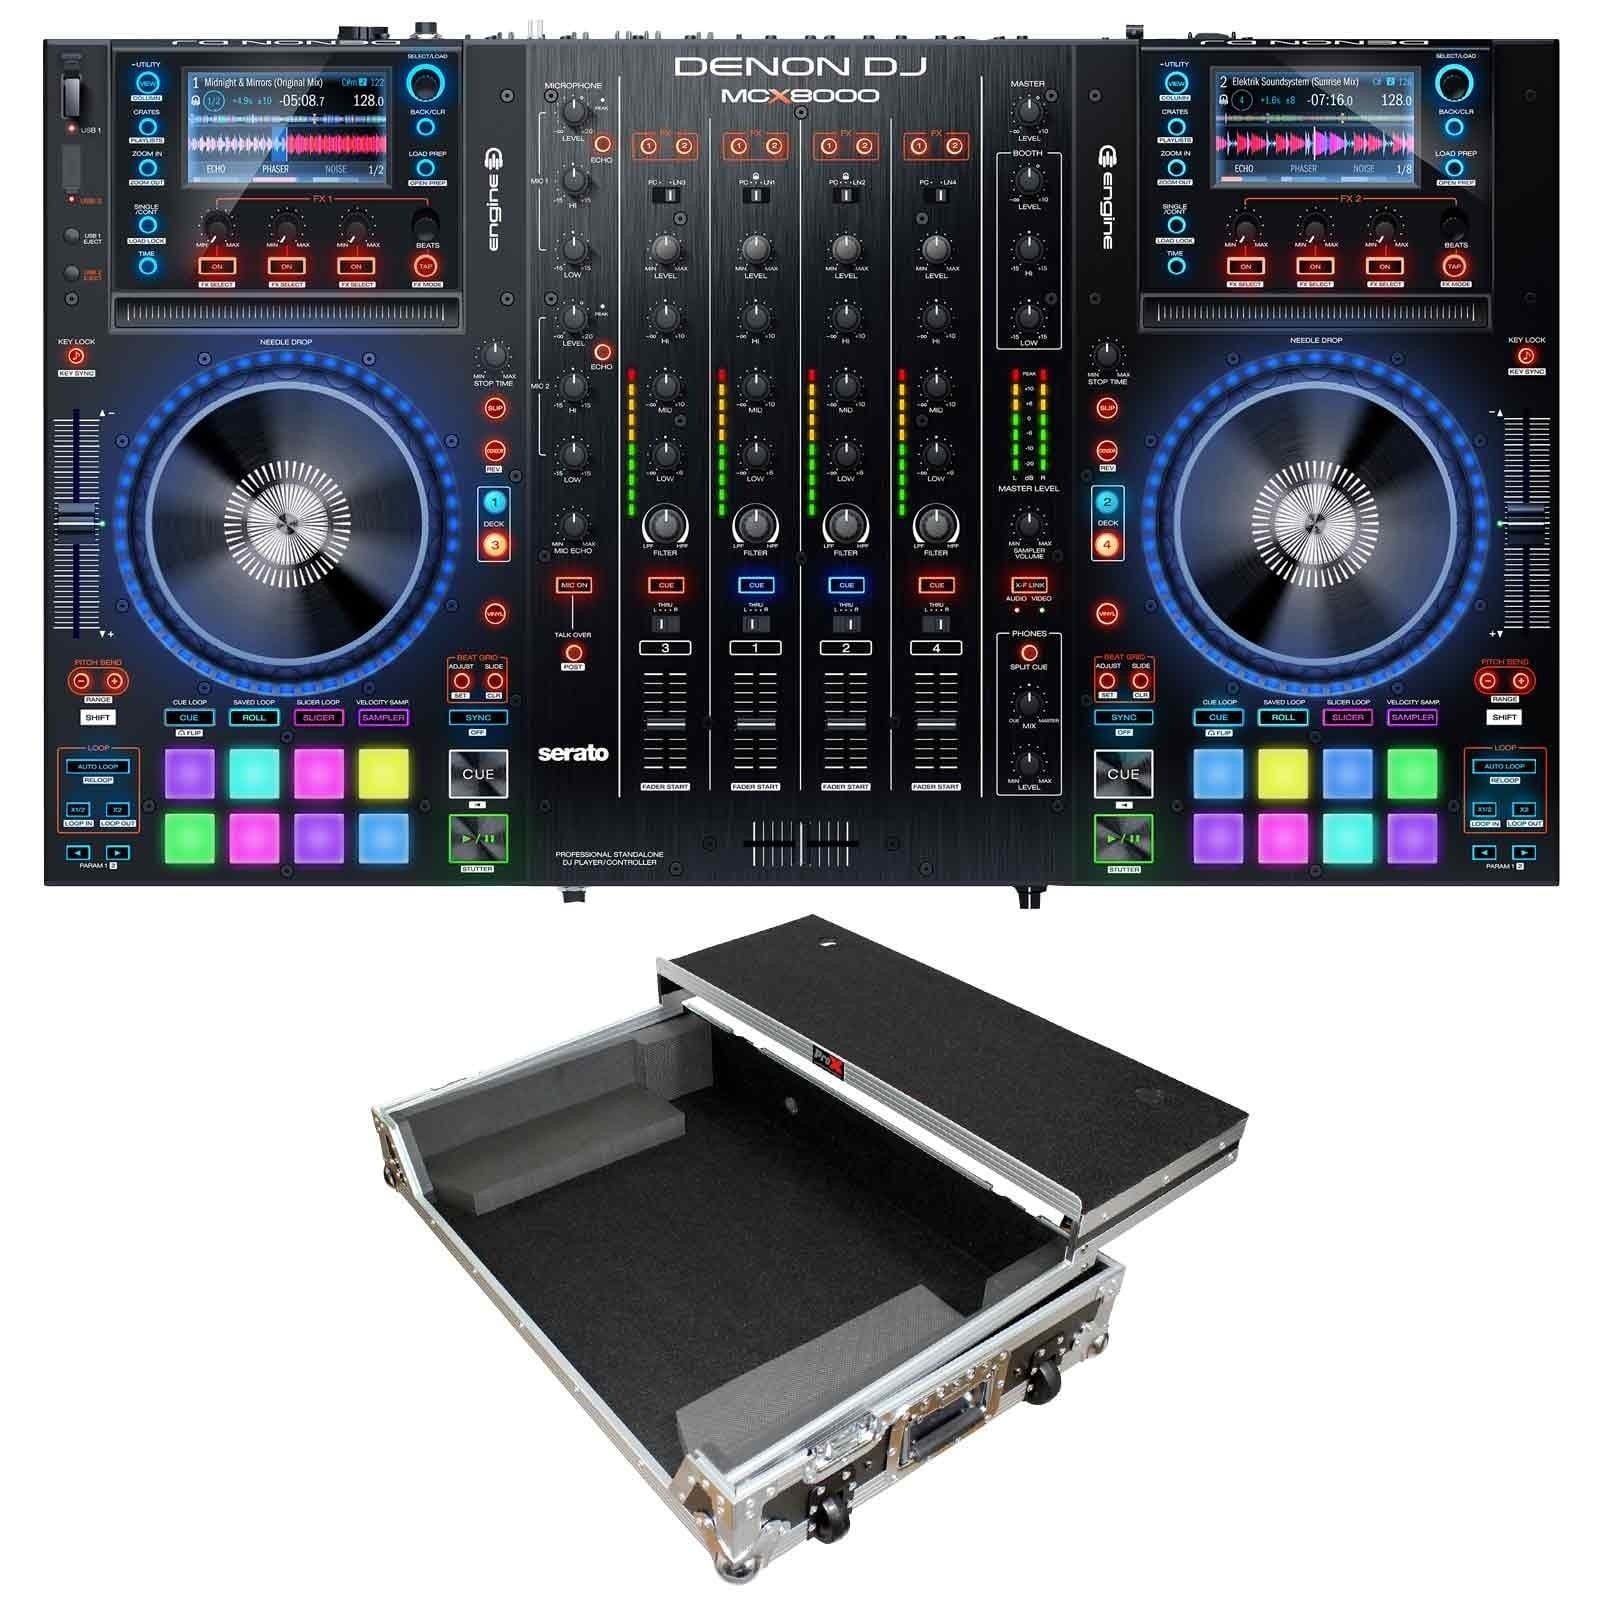 denon-dj-mcx8000-standalone-dj-player-and-dj-controller-chrome-silver-flight-case-package-d24.jpg